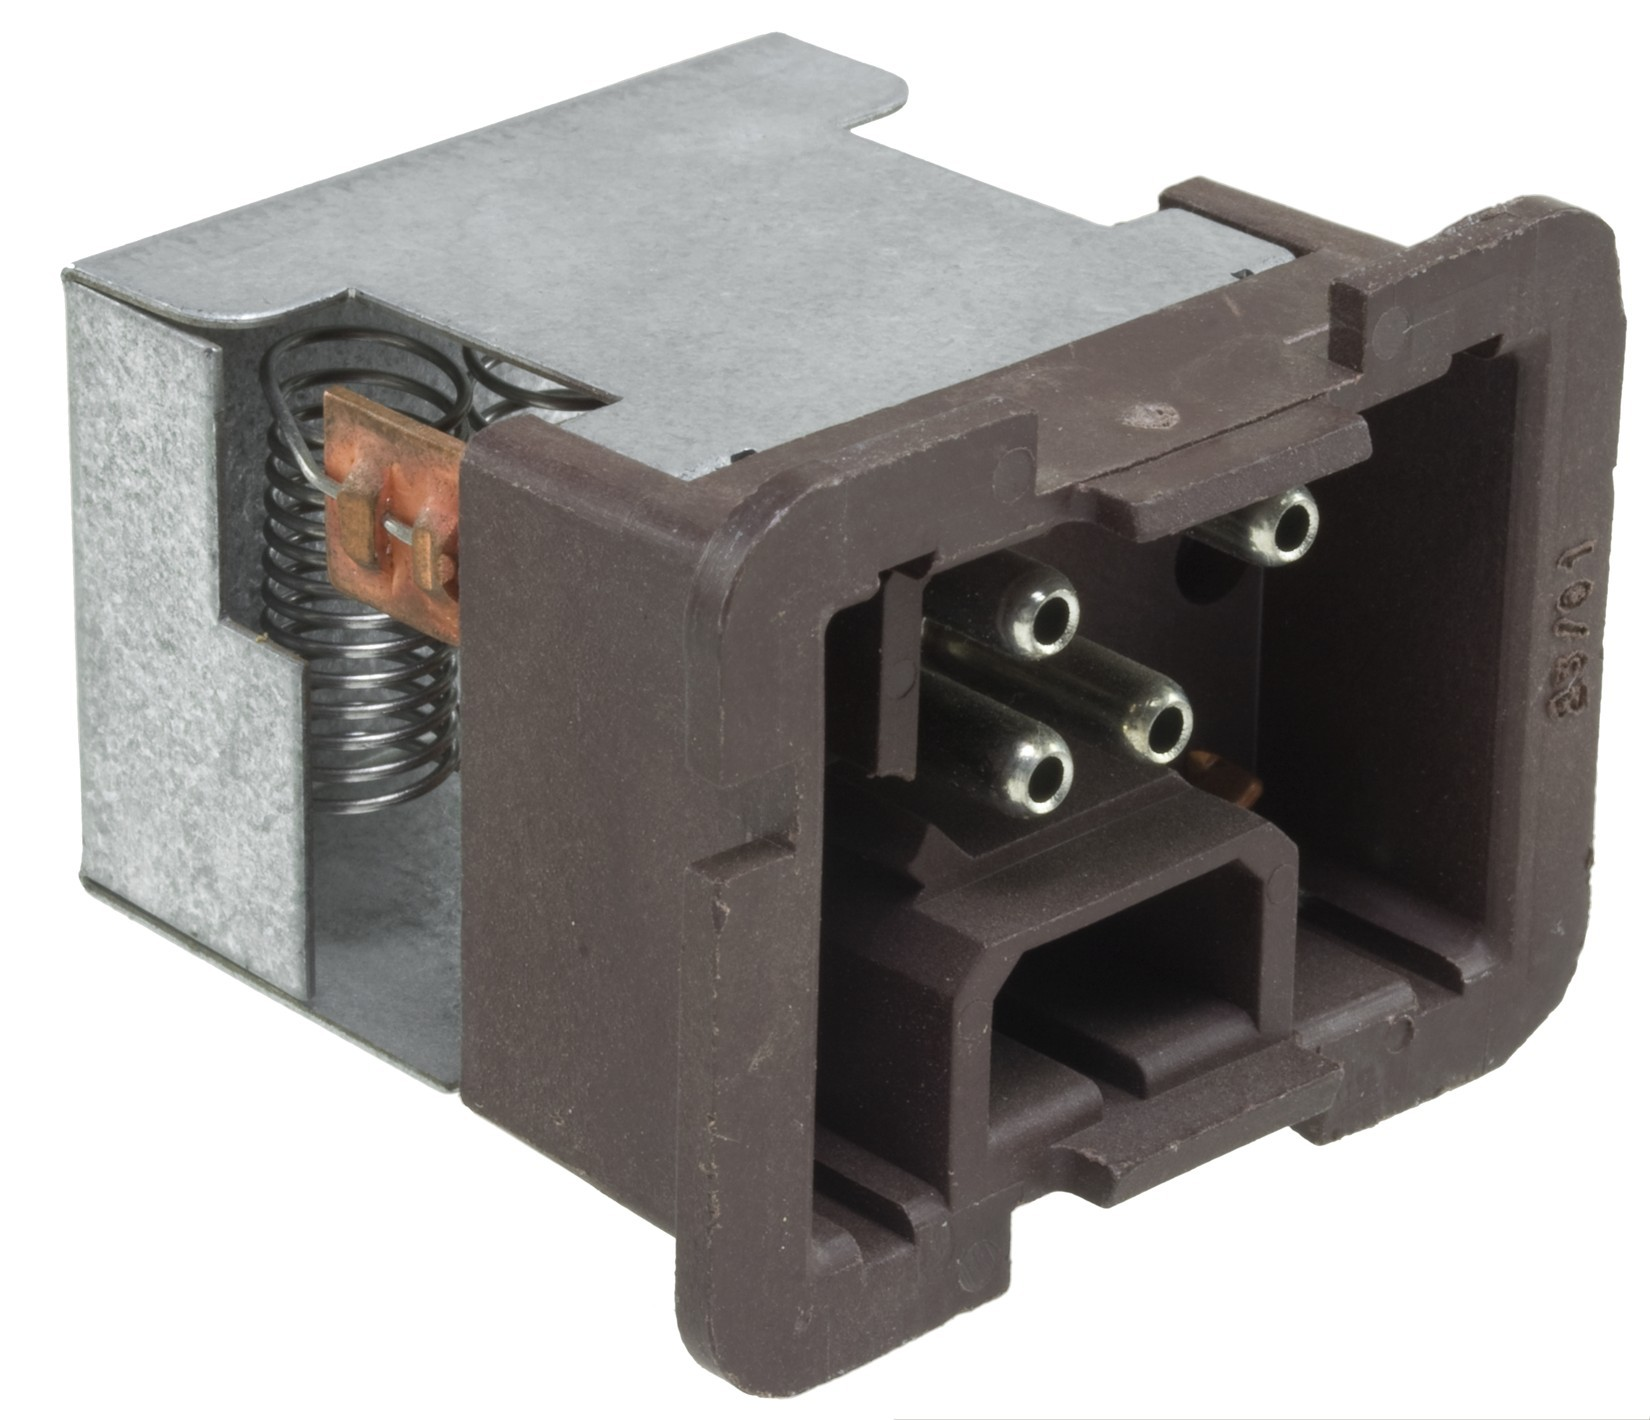 Hvac blower motor resistor wells rb1019 fits 87 93 bmw for Autozone blower motor resistor